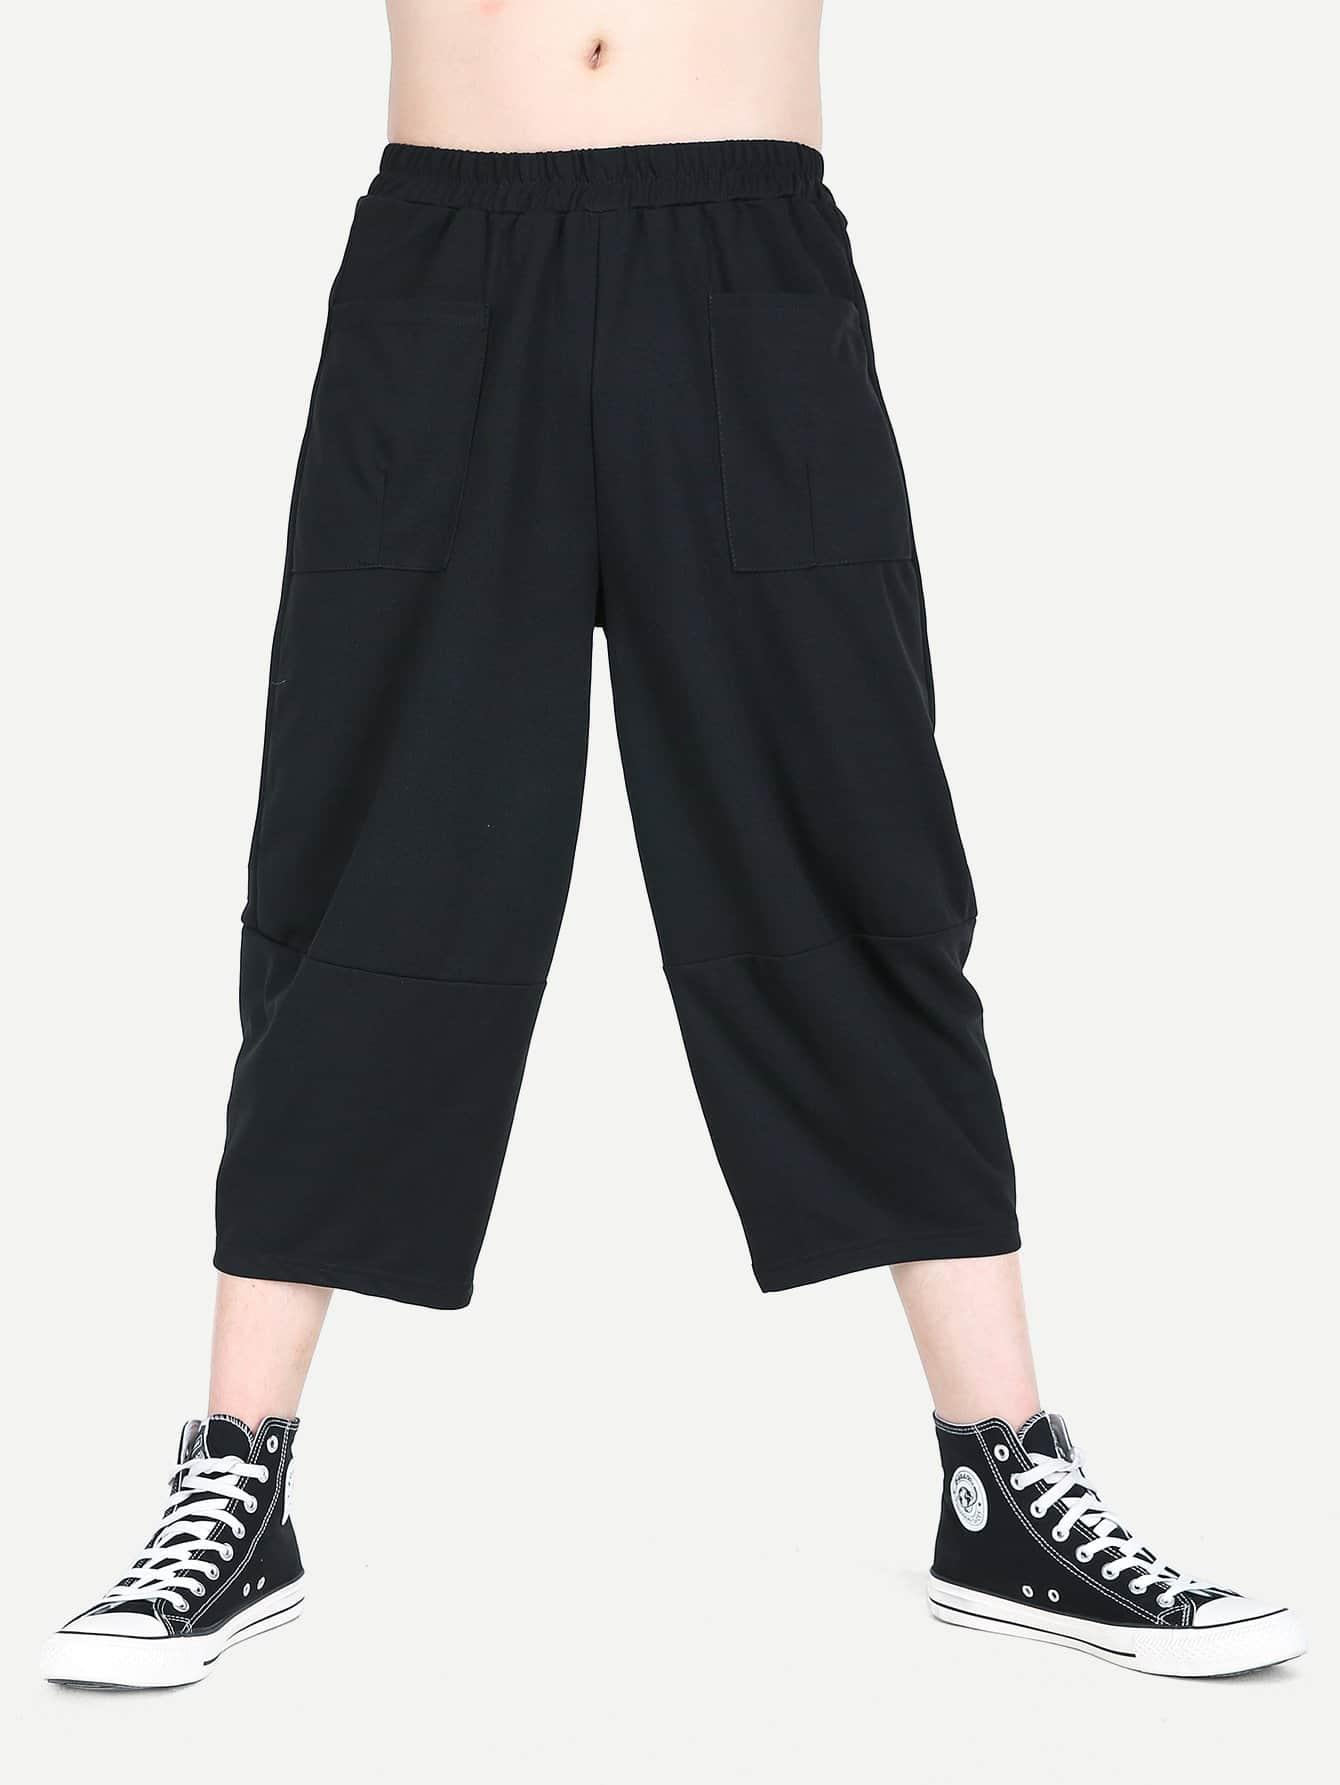 Men Elastic Waist Plain Wide Leg Pants casual elastic waist printed ninth women s wide leg pants